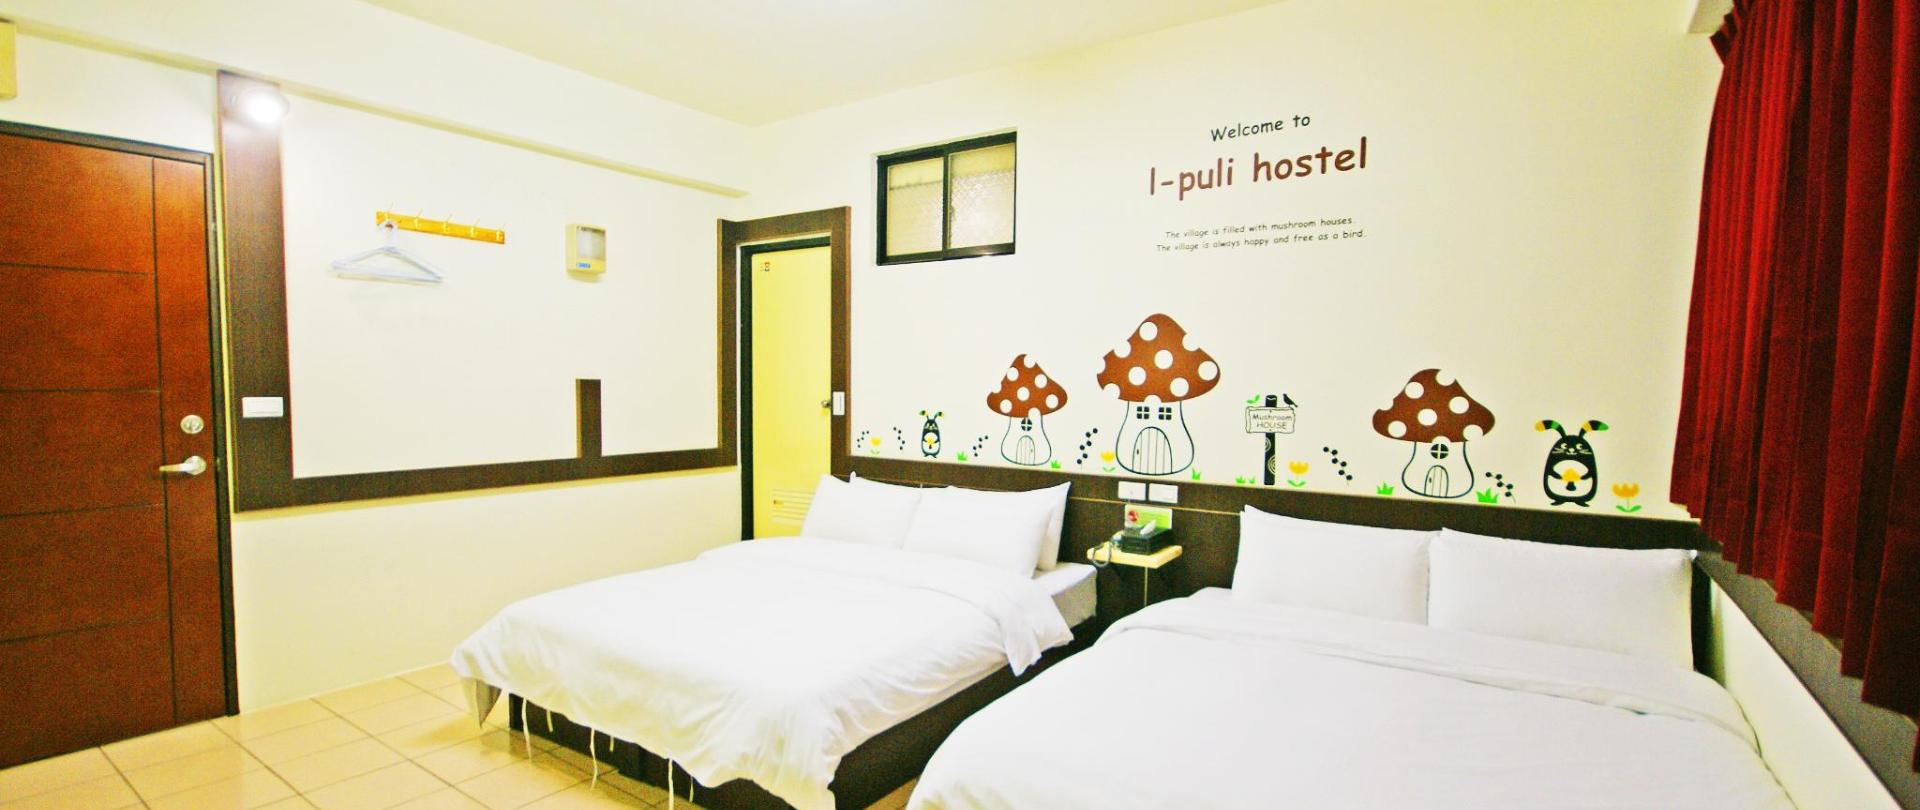 I Puli Hostel